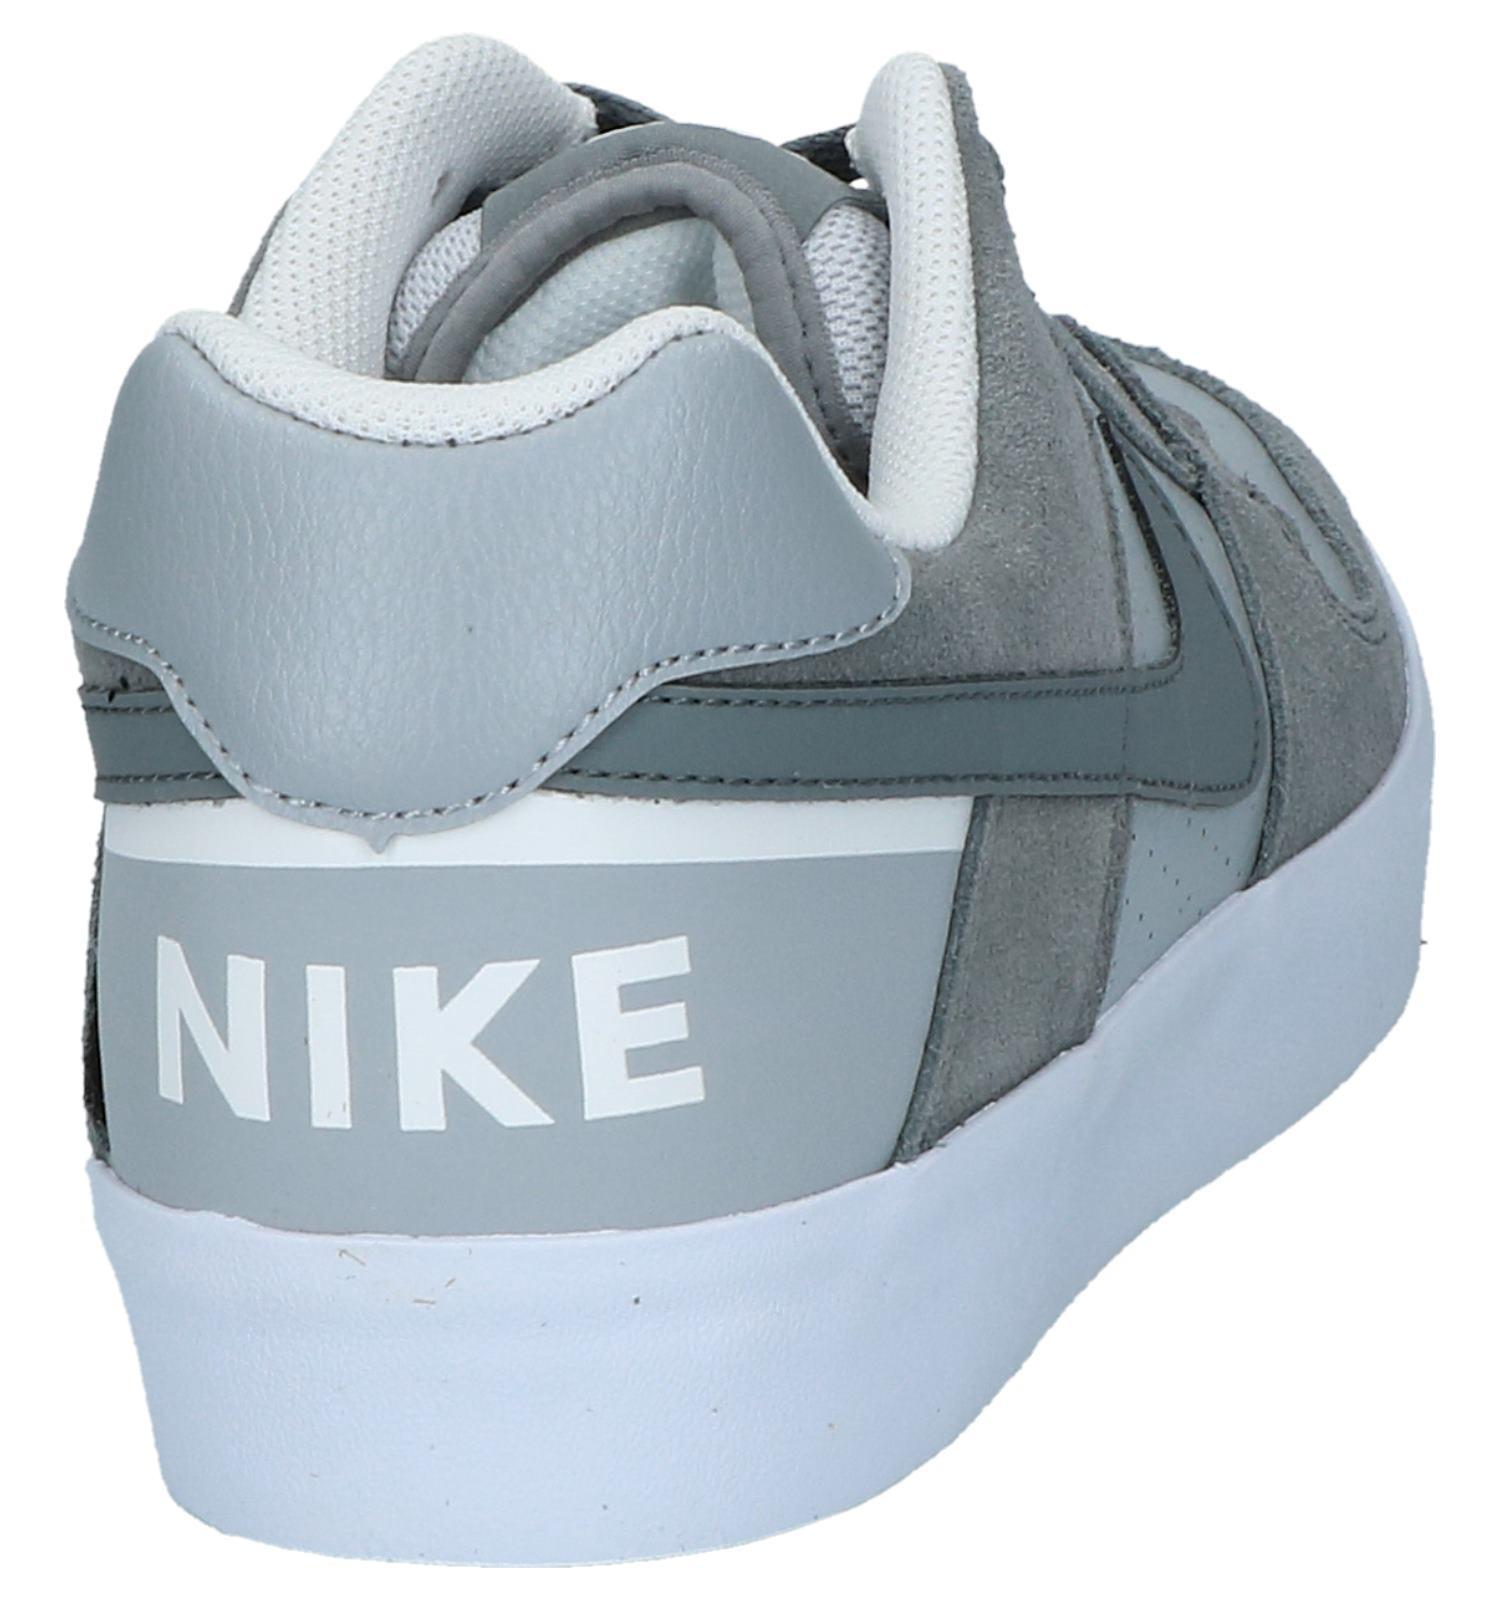 best website 458ef b5d83 Nike SB Delta Force Vulc Grijze Sneakers | TORFS.BE | Gratis verzend en  retour